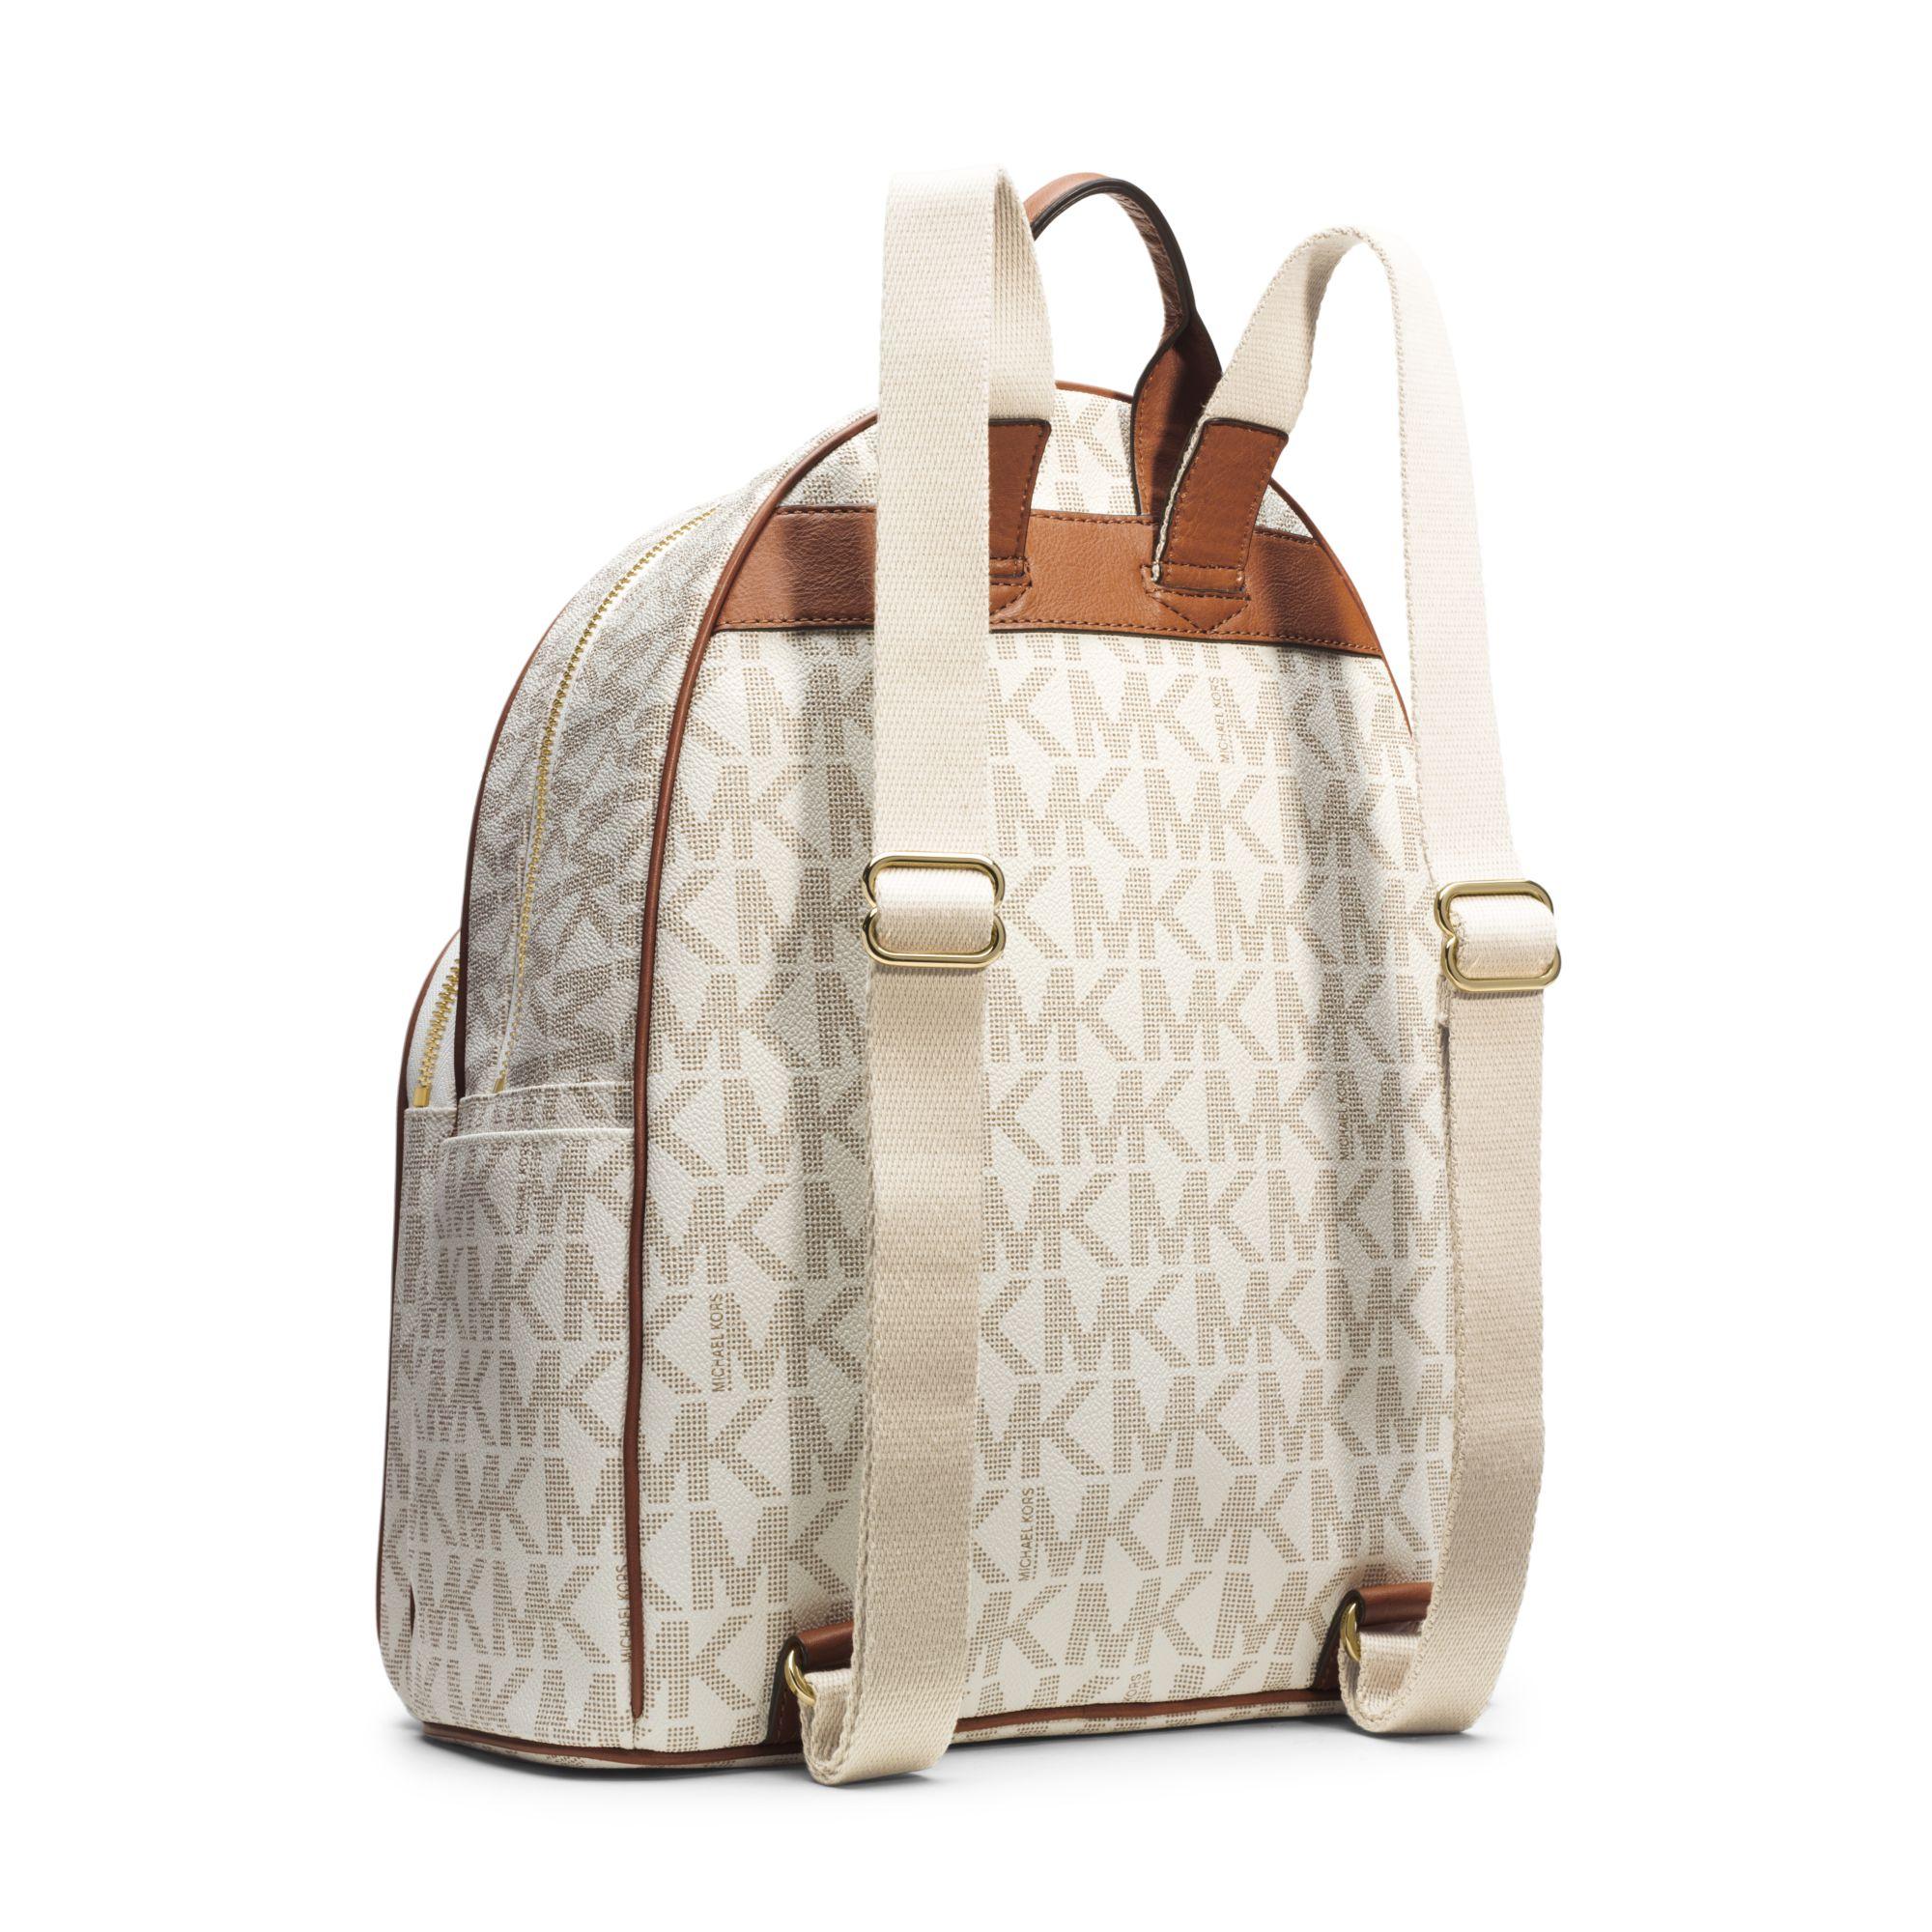 3c0dc5ca87a066 michael kors backpack brown jetset canvas tan bag house of fraser ...